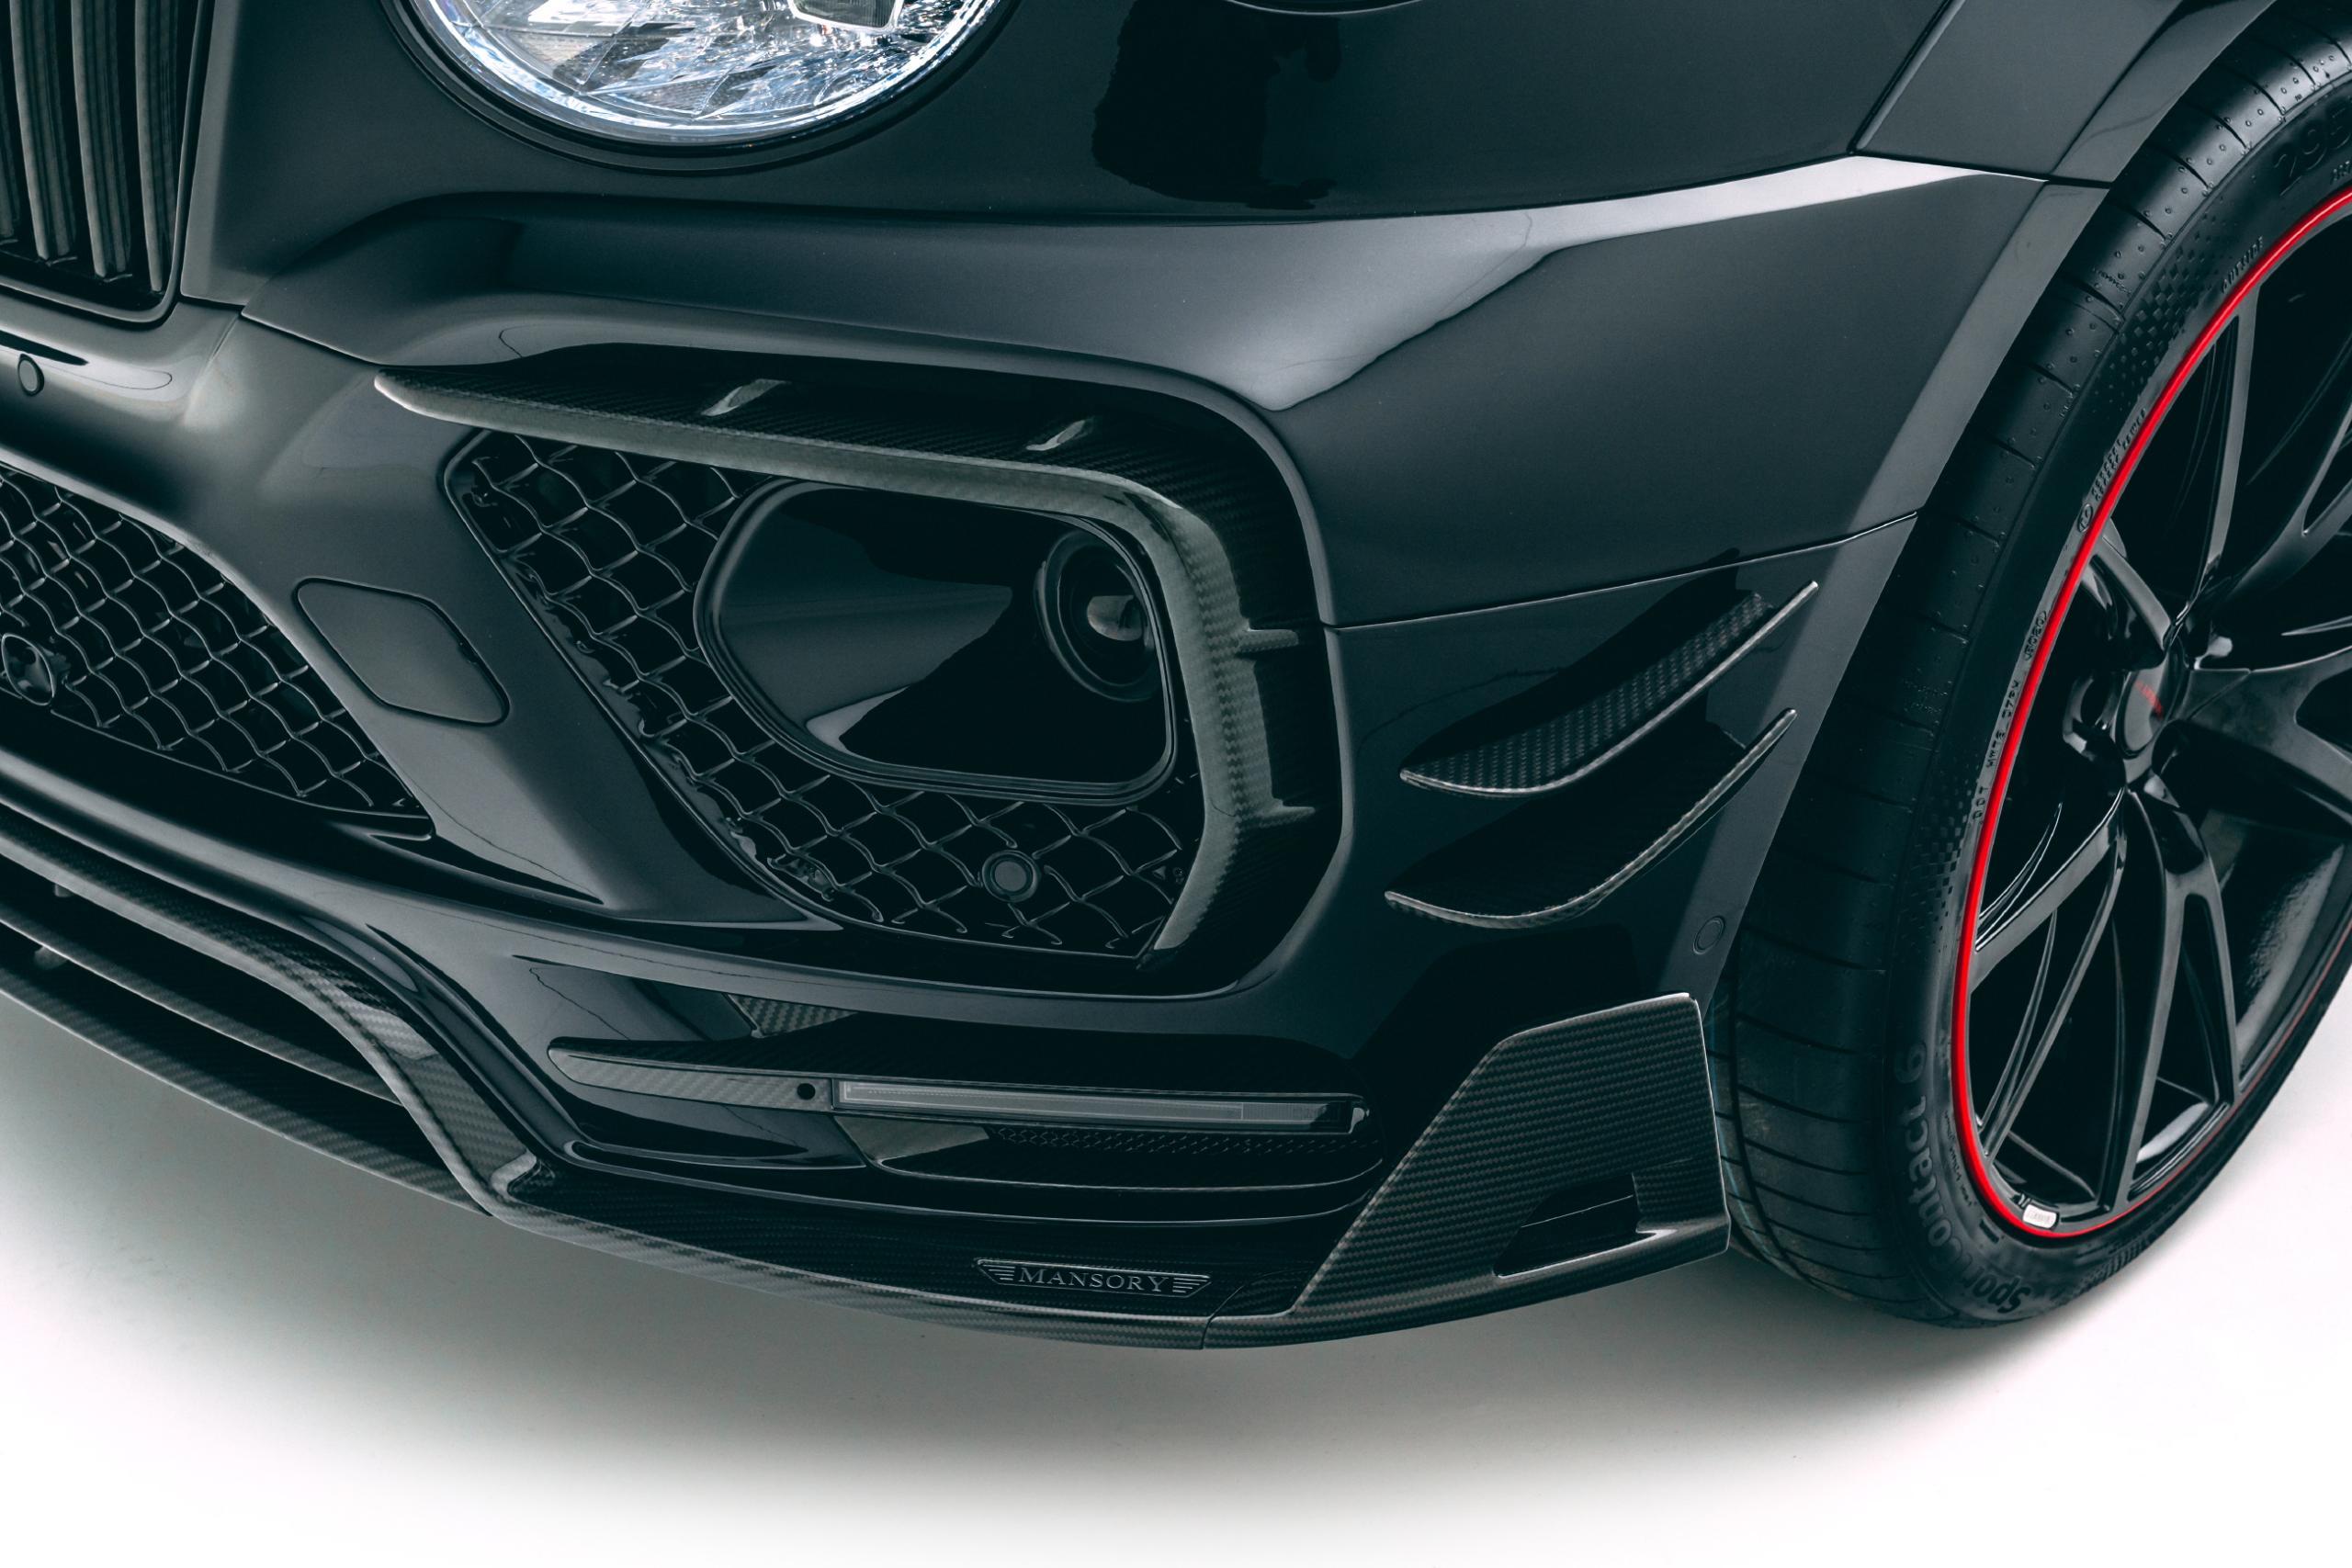 mansory new bentayga wide body kit carbon fiber front bumper led drl sfront splitter 2021